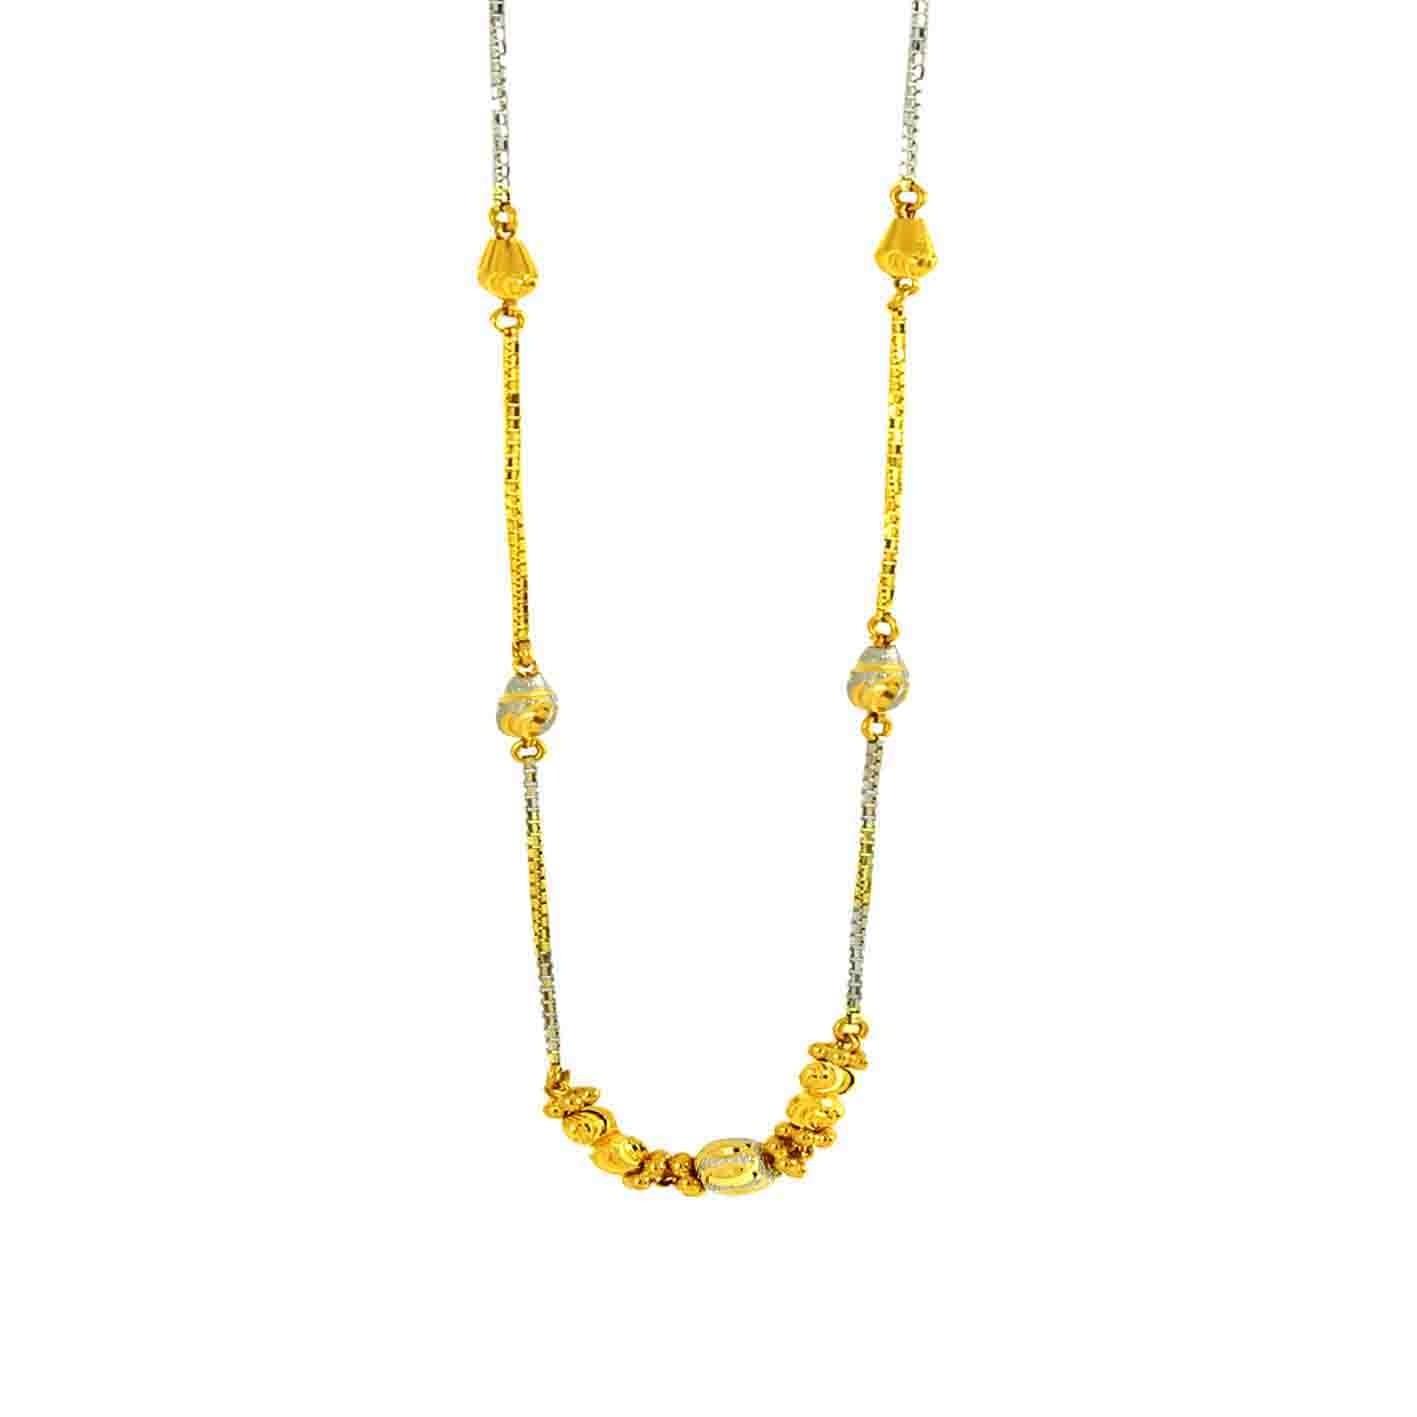 "22ct 916 Hallmark Yellow Gold Choker Chain with Rhodium 16""  CC5"